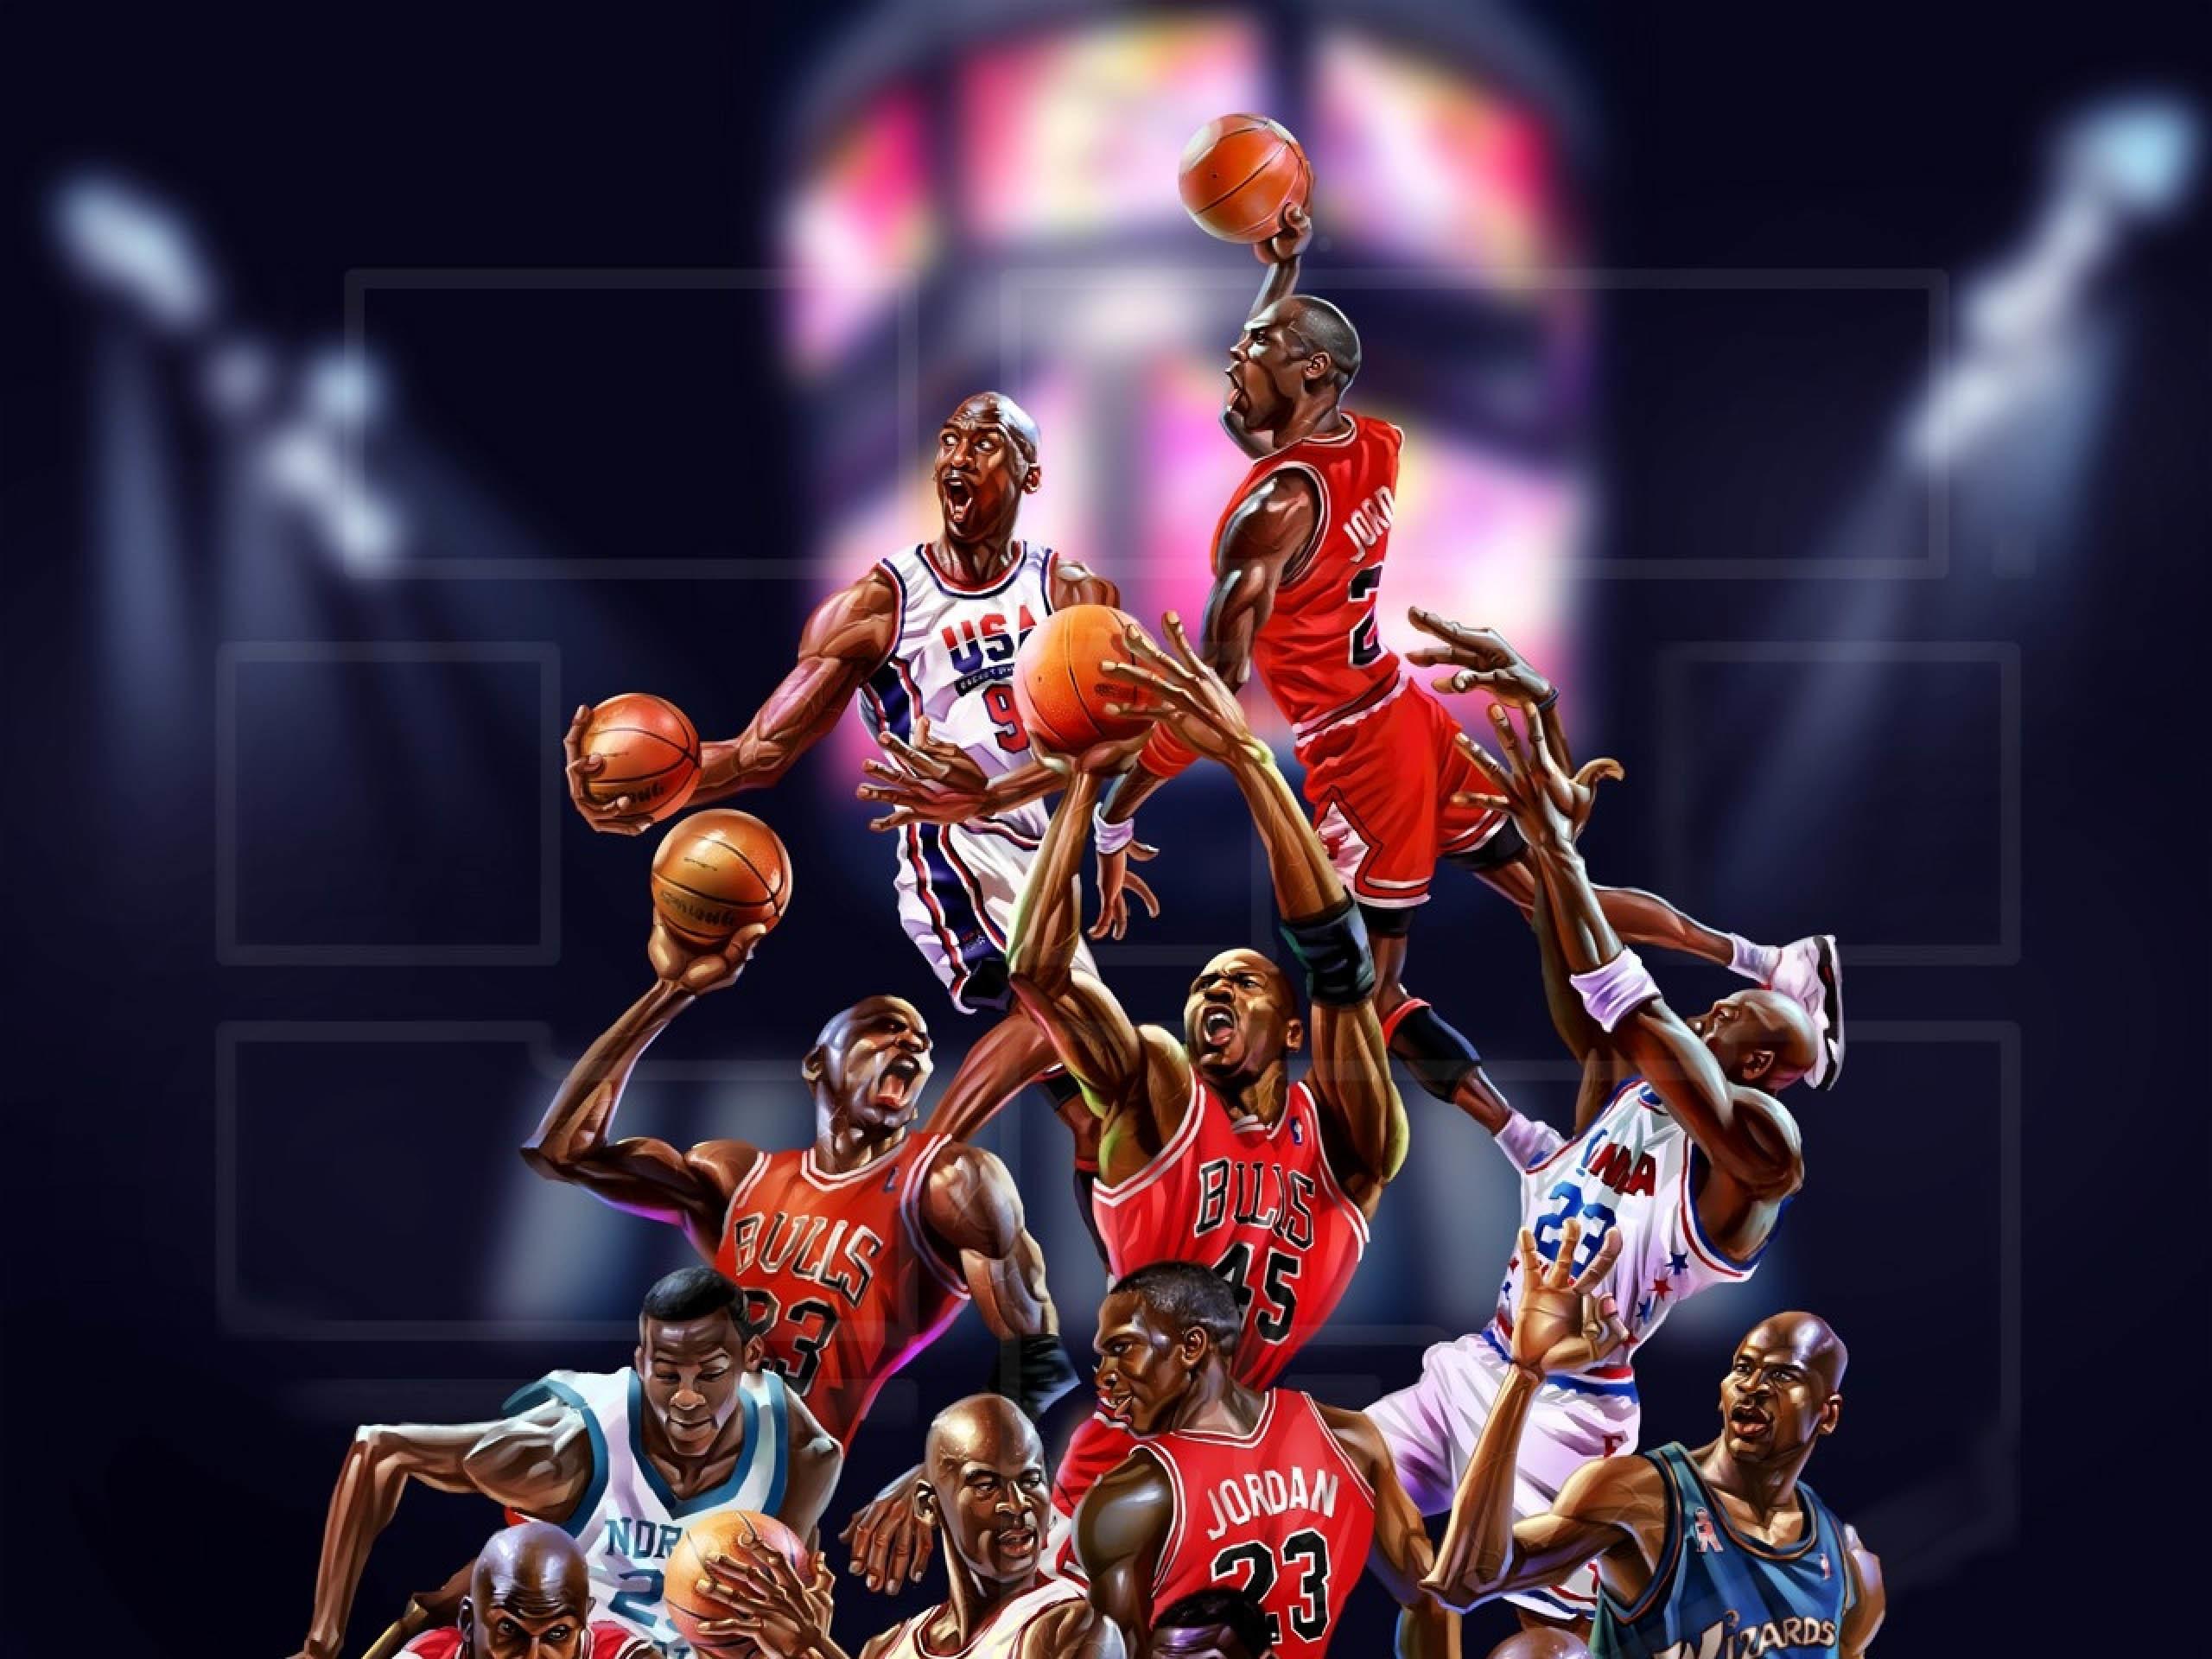 Michael Jordan Live Wallpaper 67 images